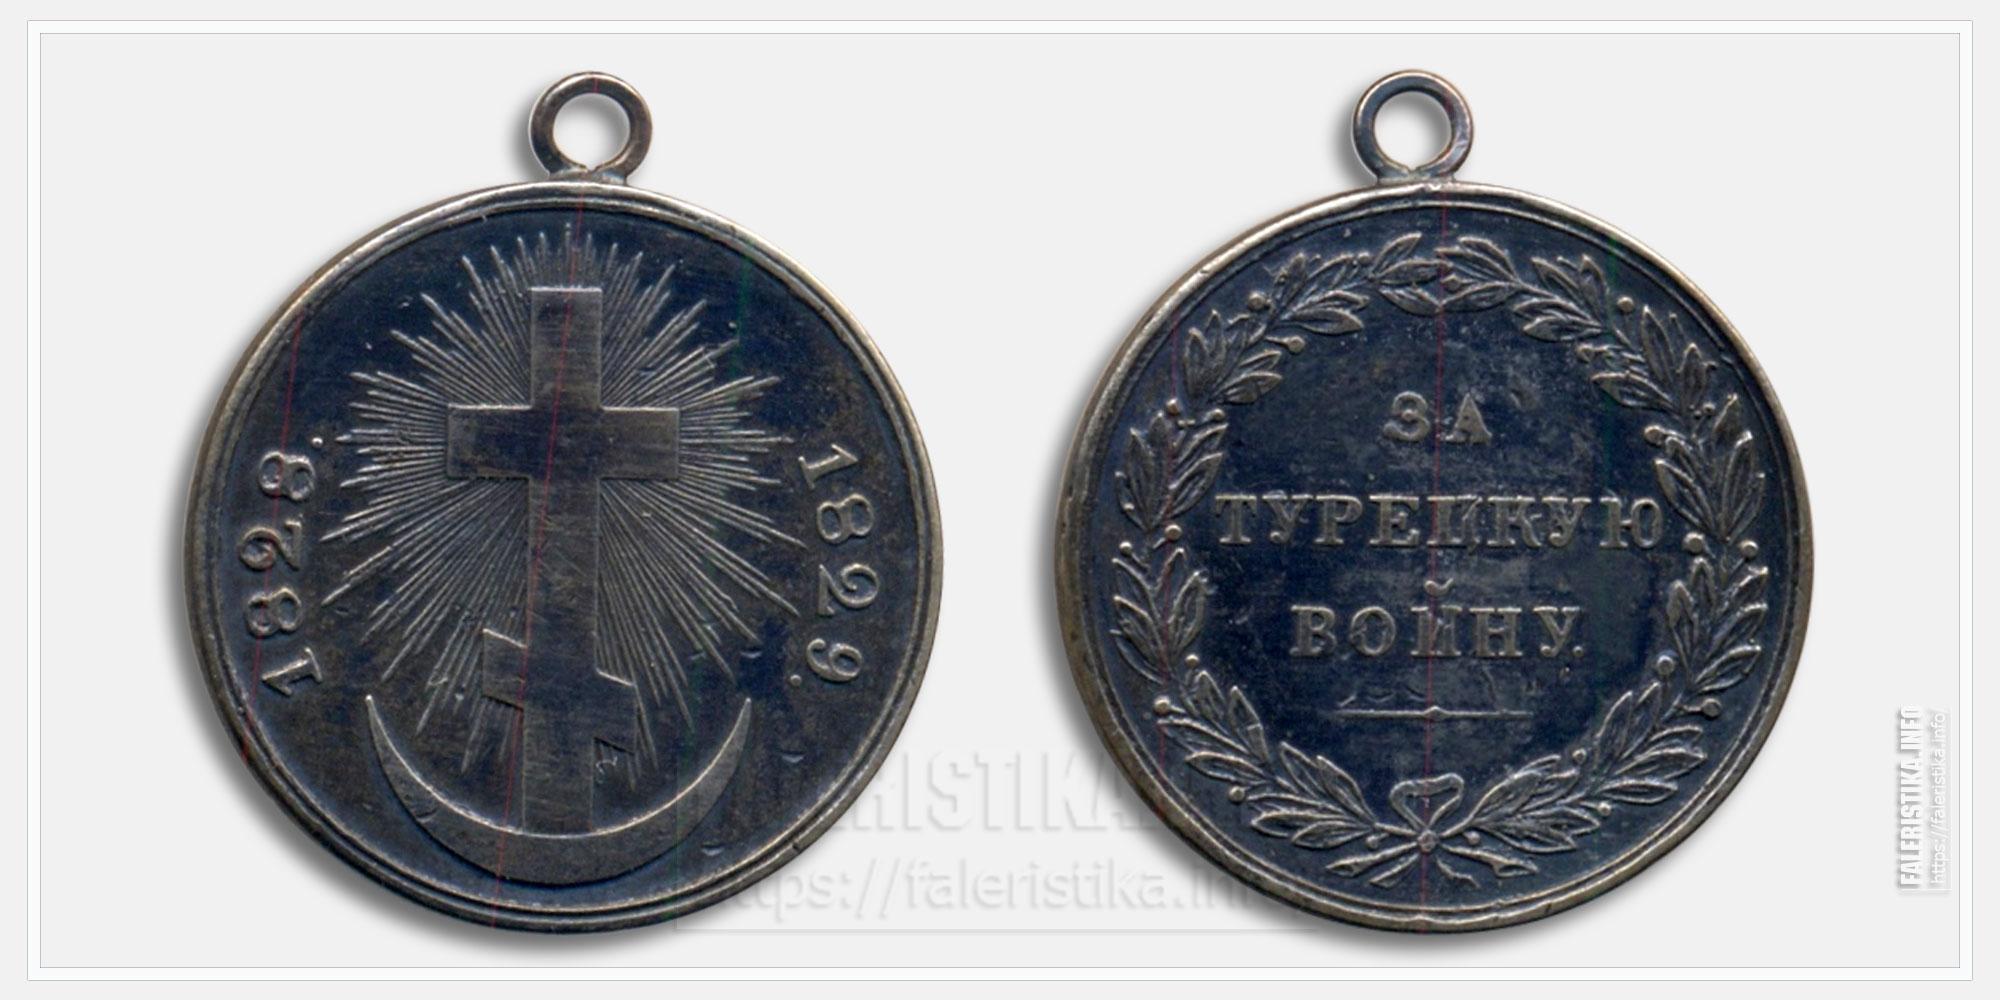 Медаль «За Турецкую войну» 1828-1829 (копия)